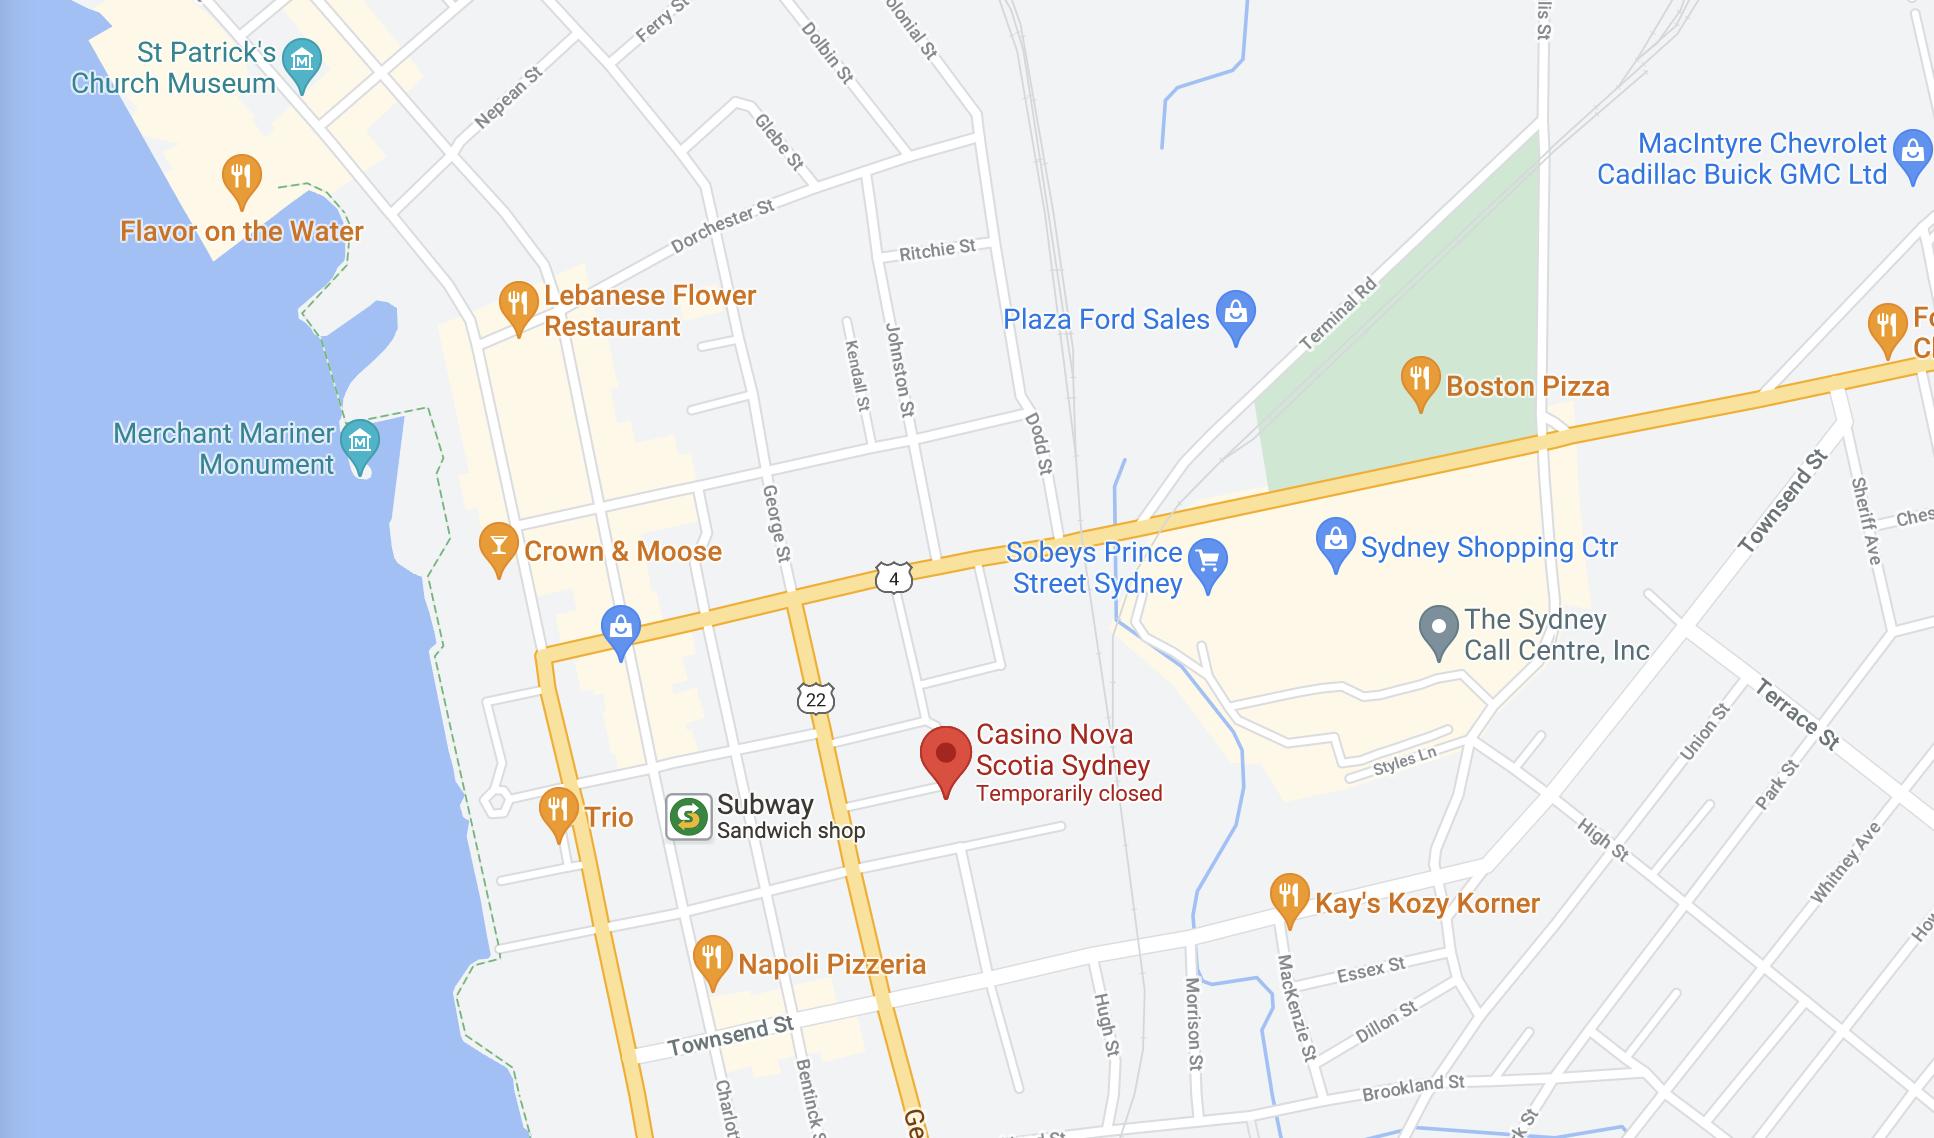 Find Casino Nova Scotia Sydney